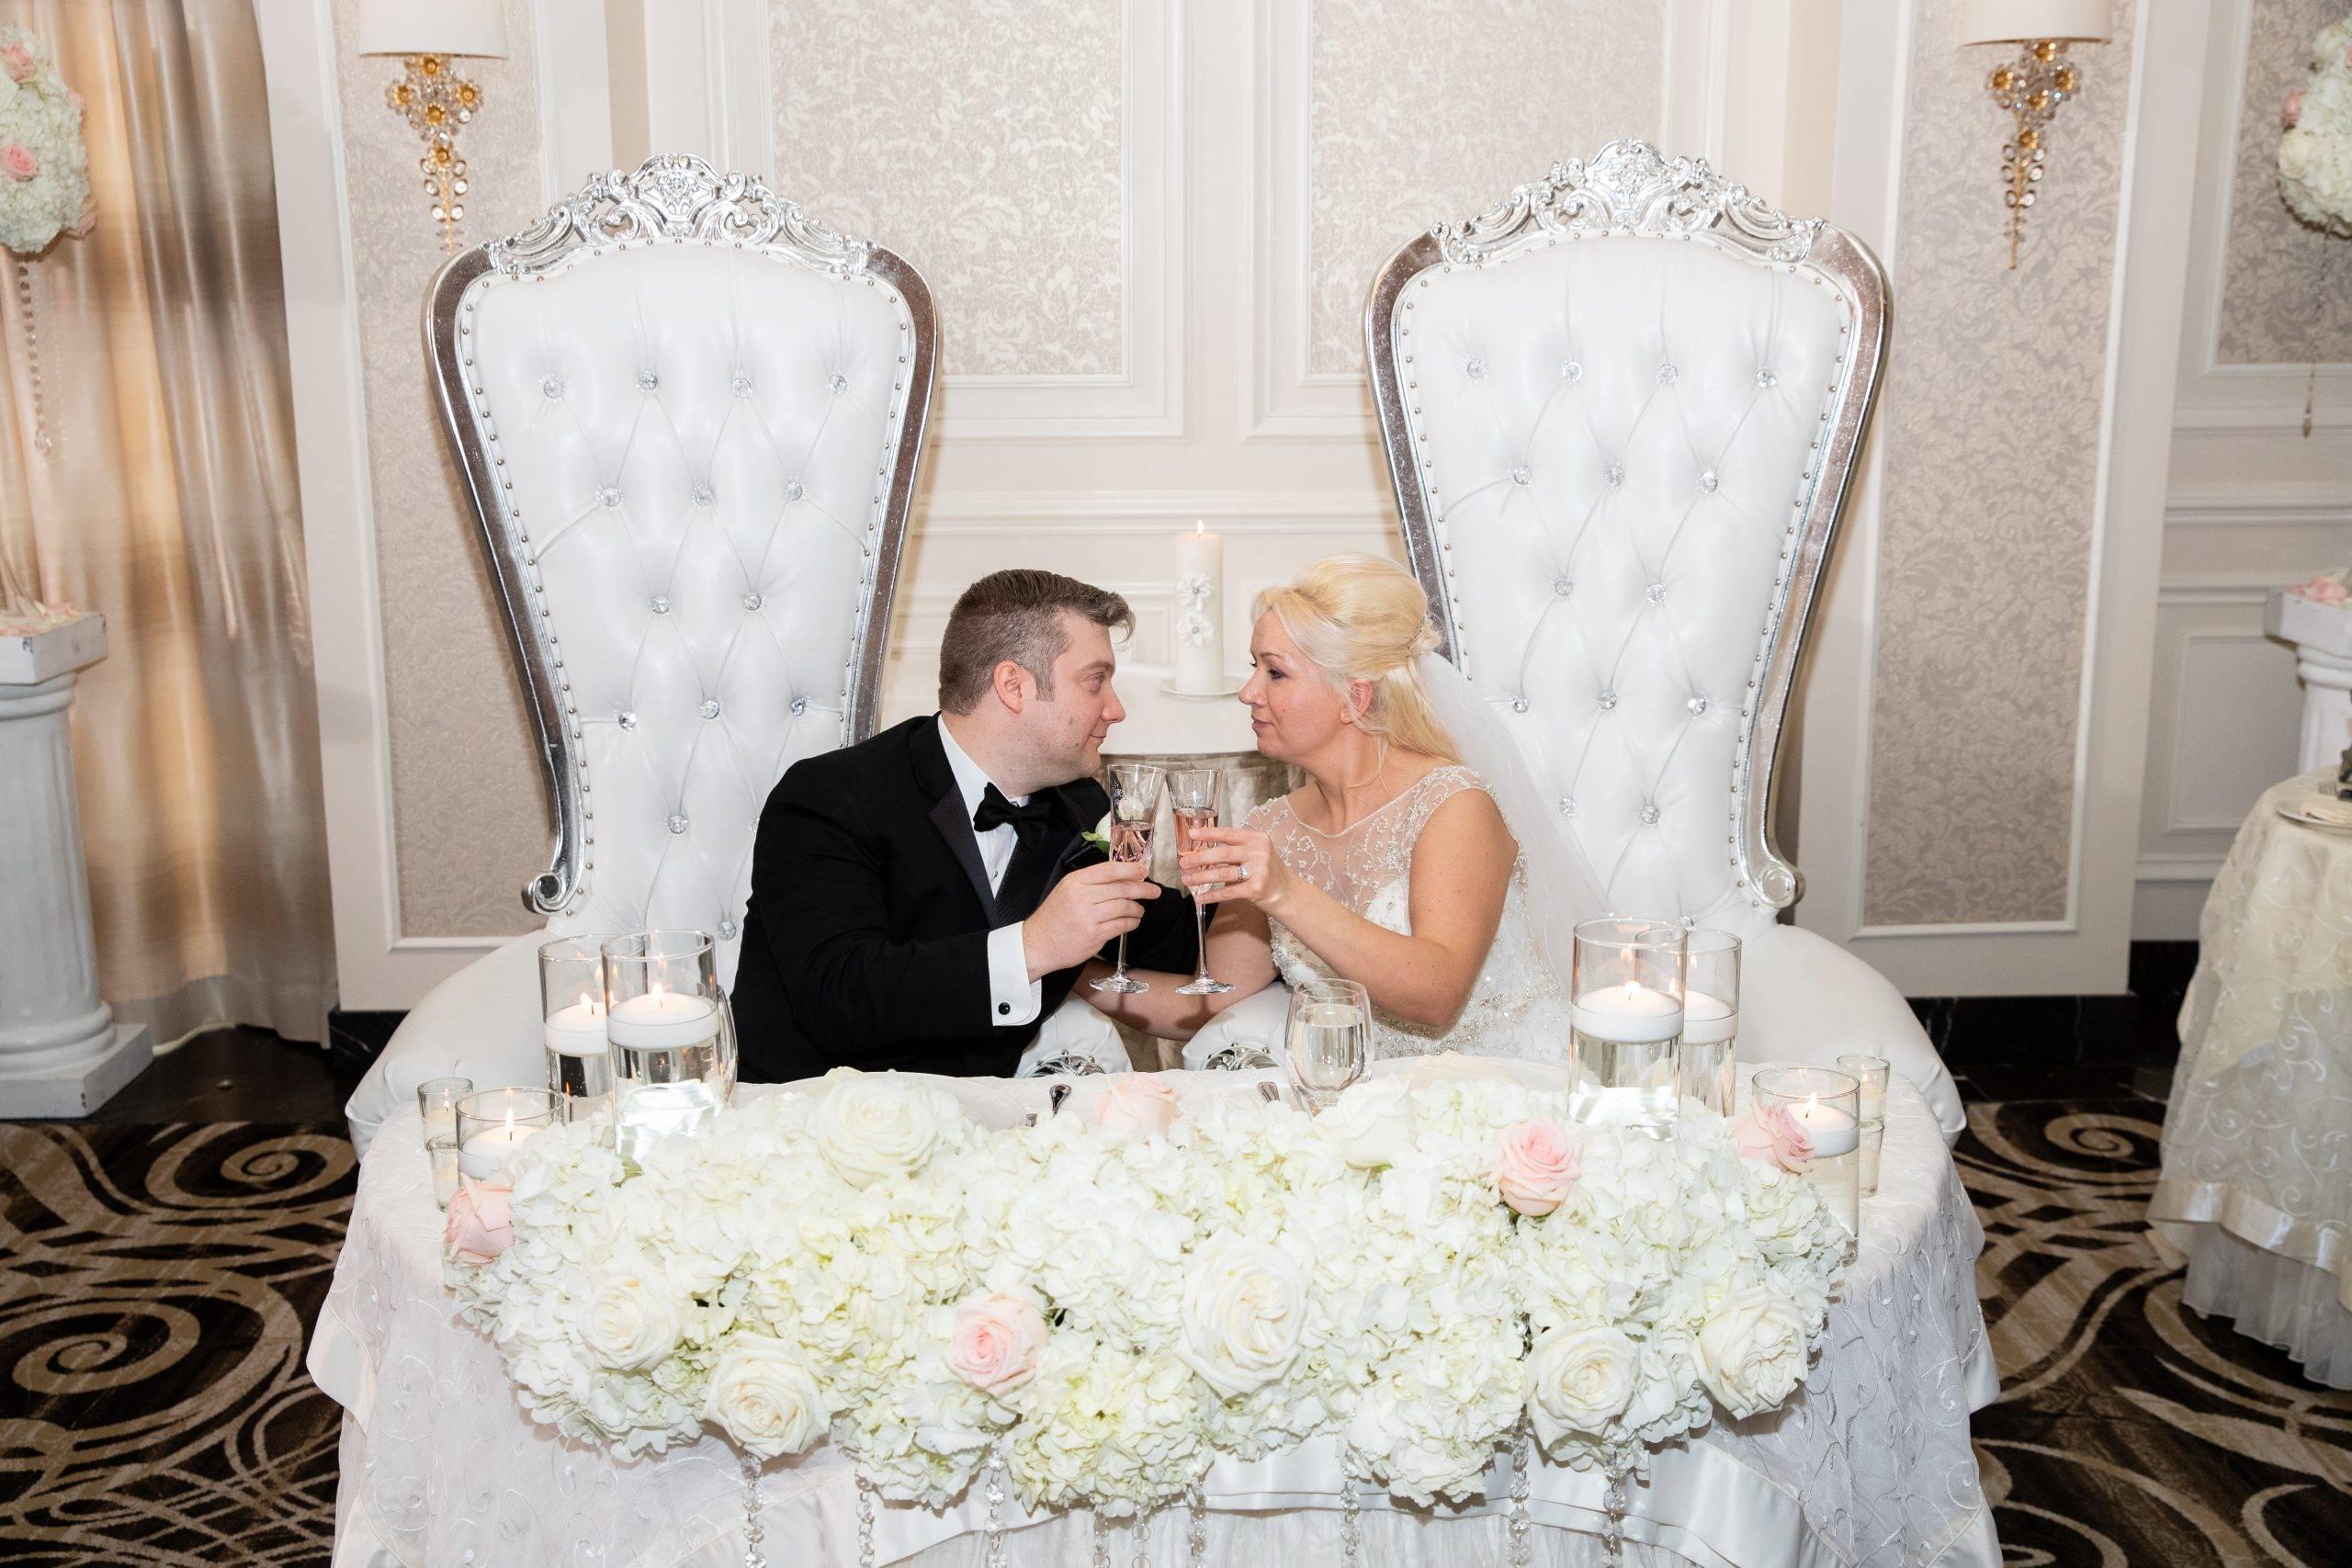 Meadow Wood bride and groom table